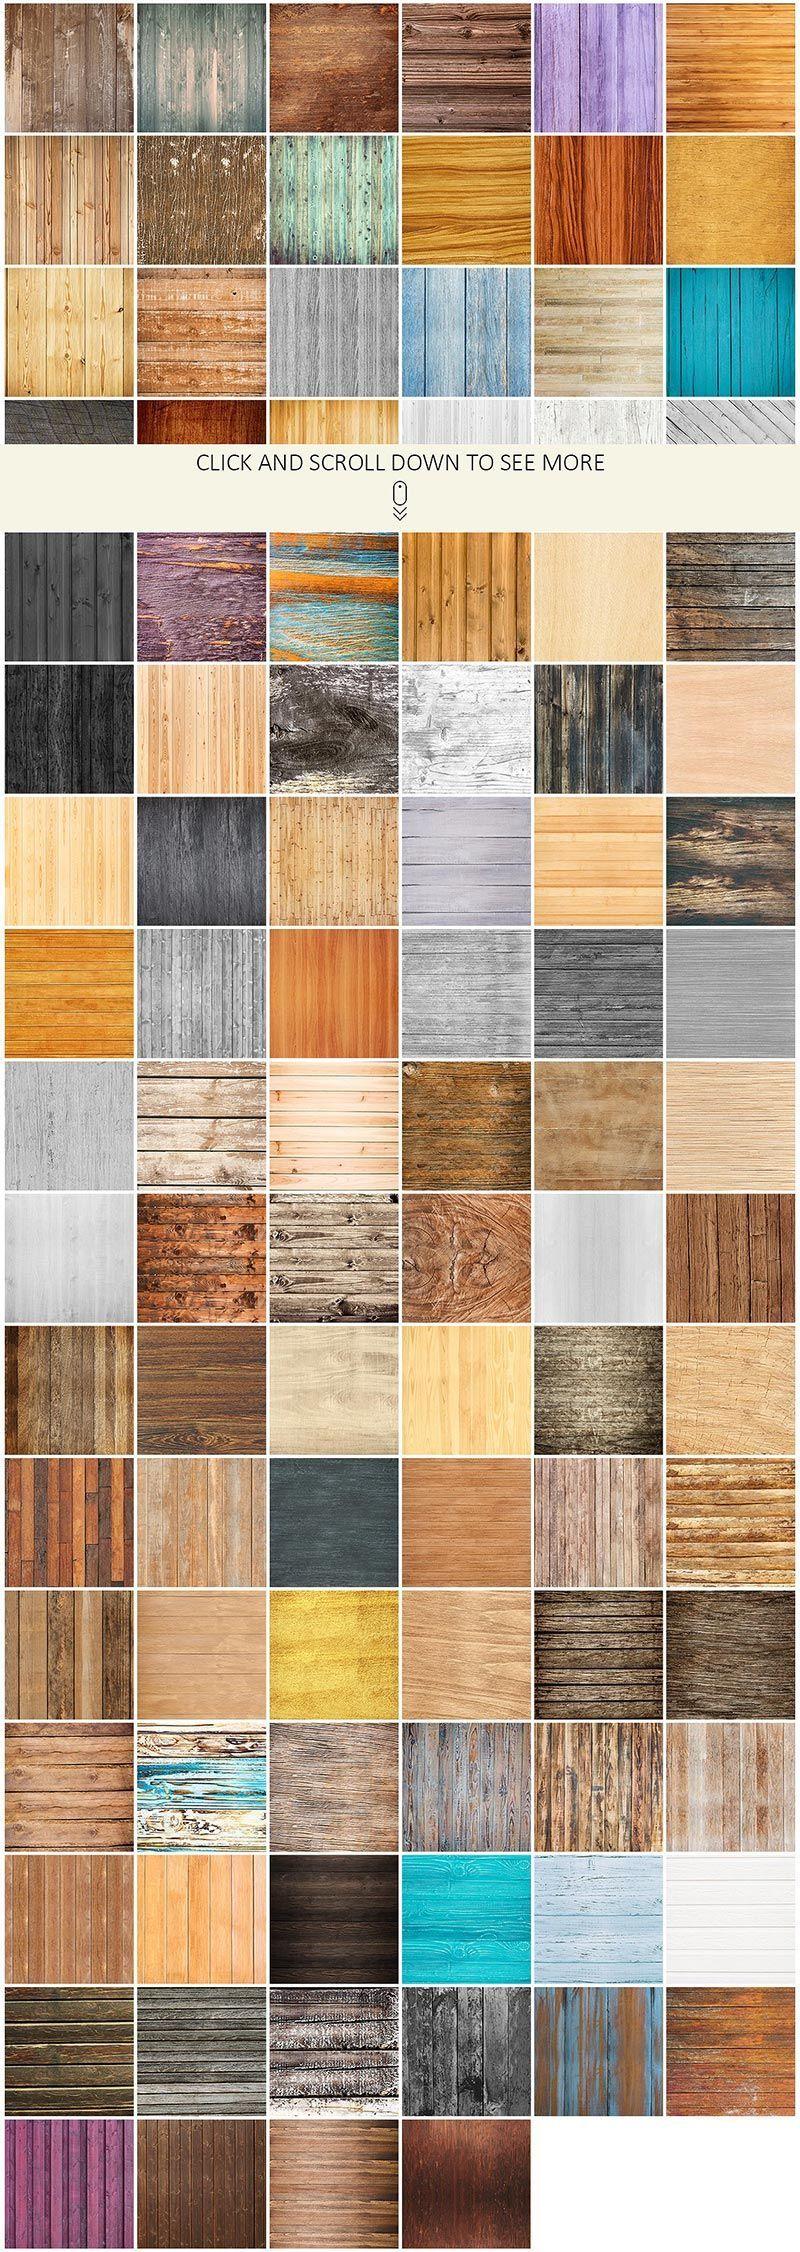 دانلود استوک تکسچر چوب Creativemarket 100 Real Wood Textures